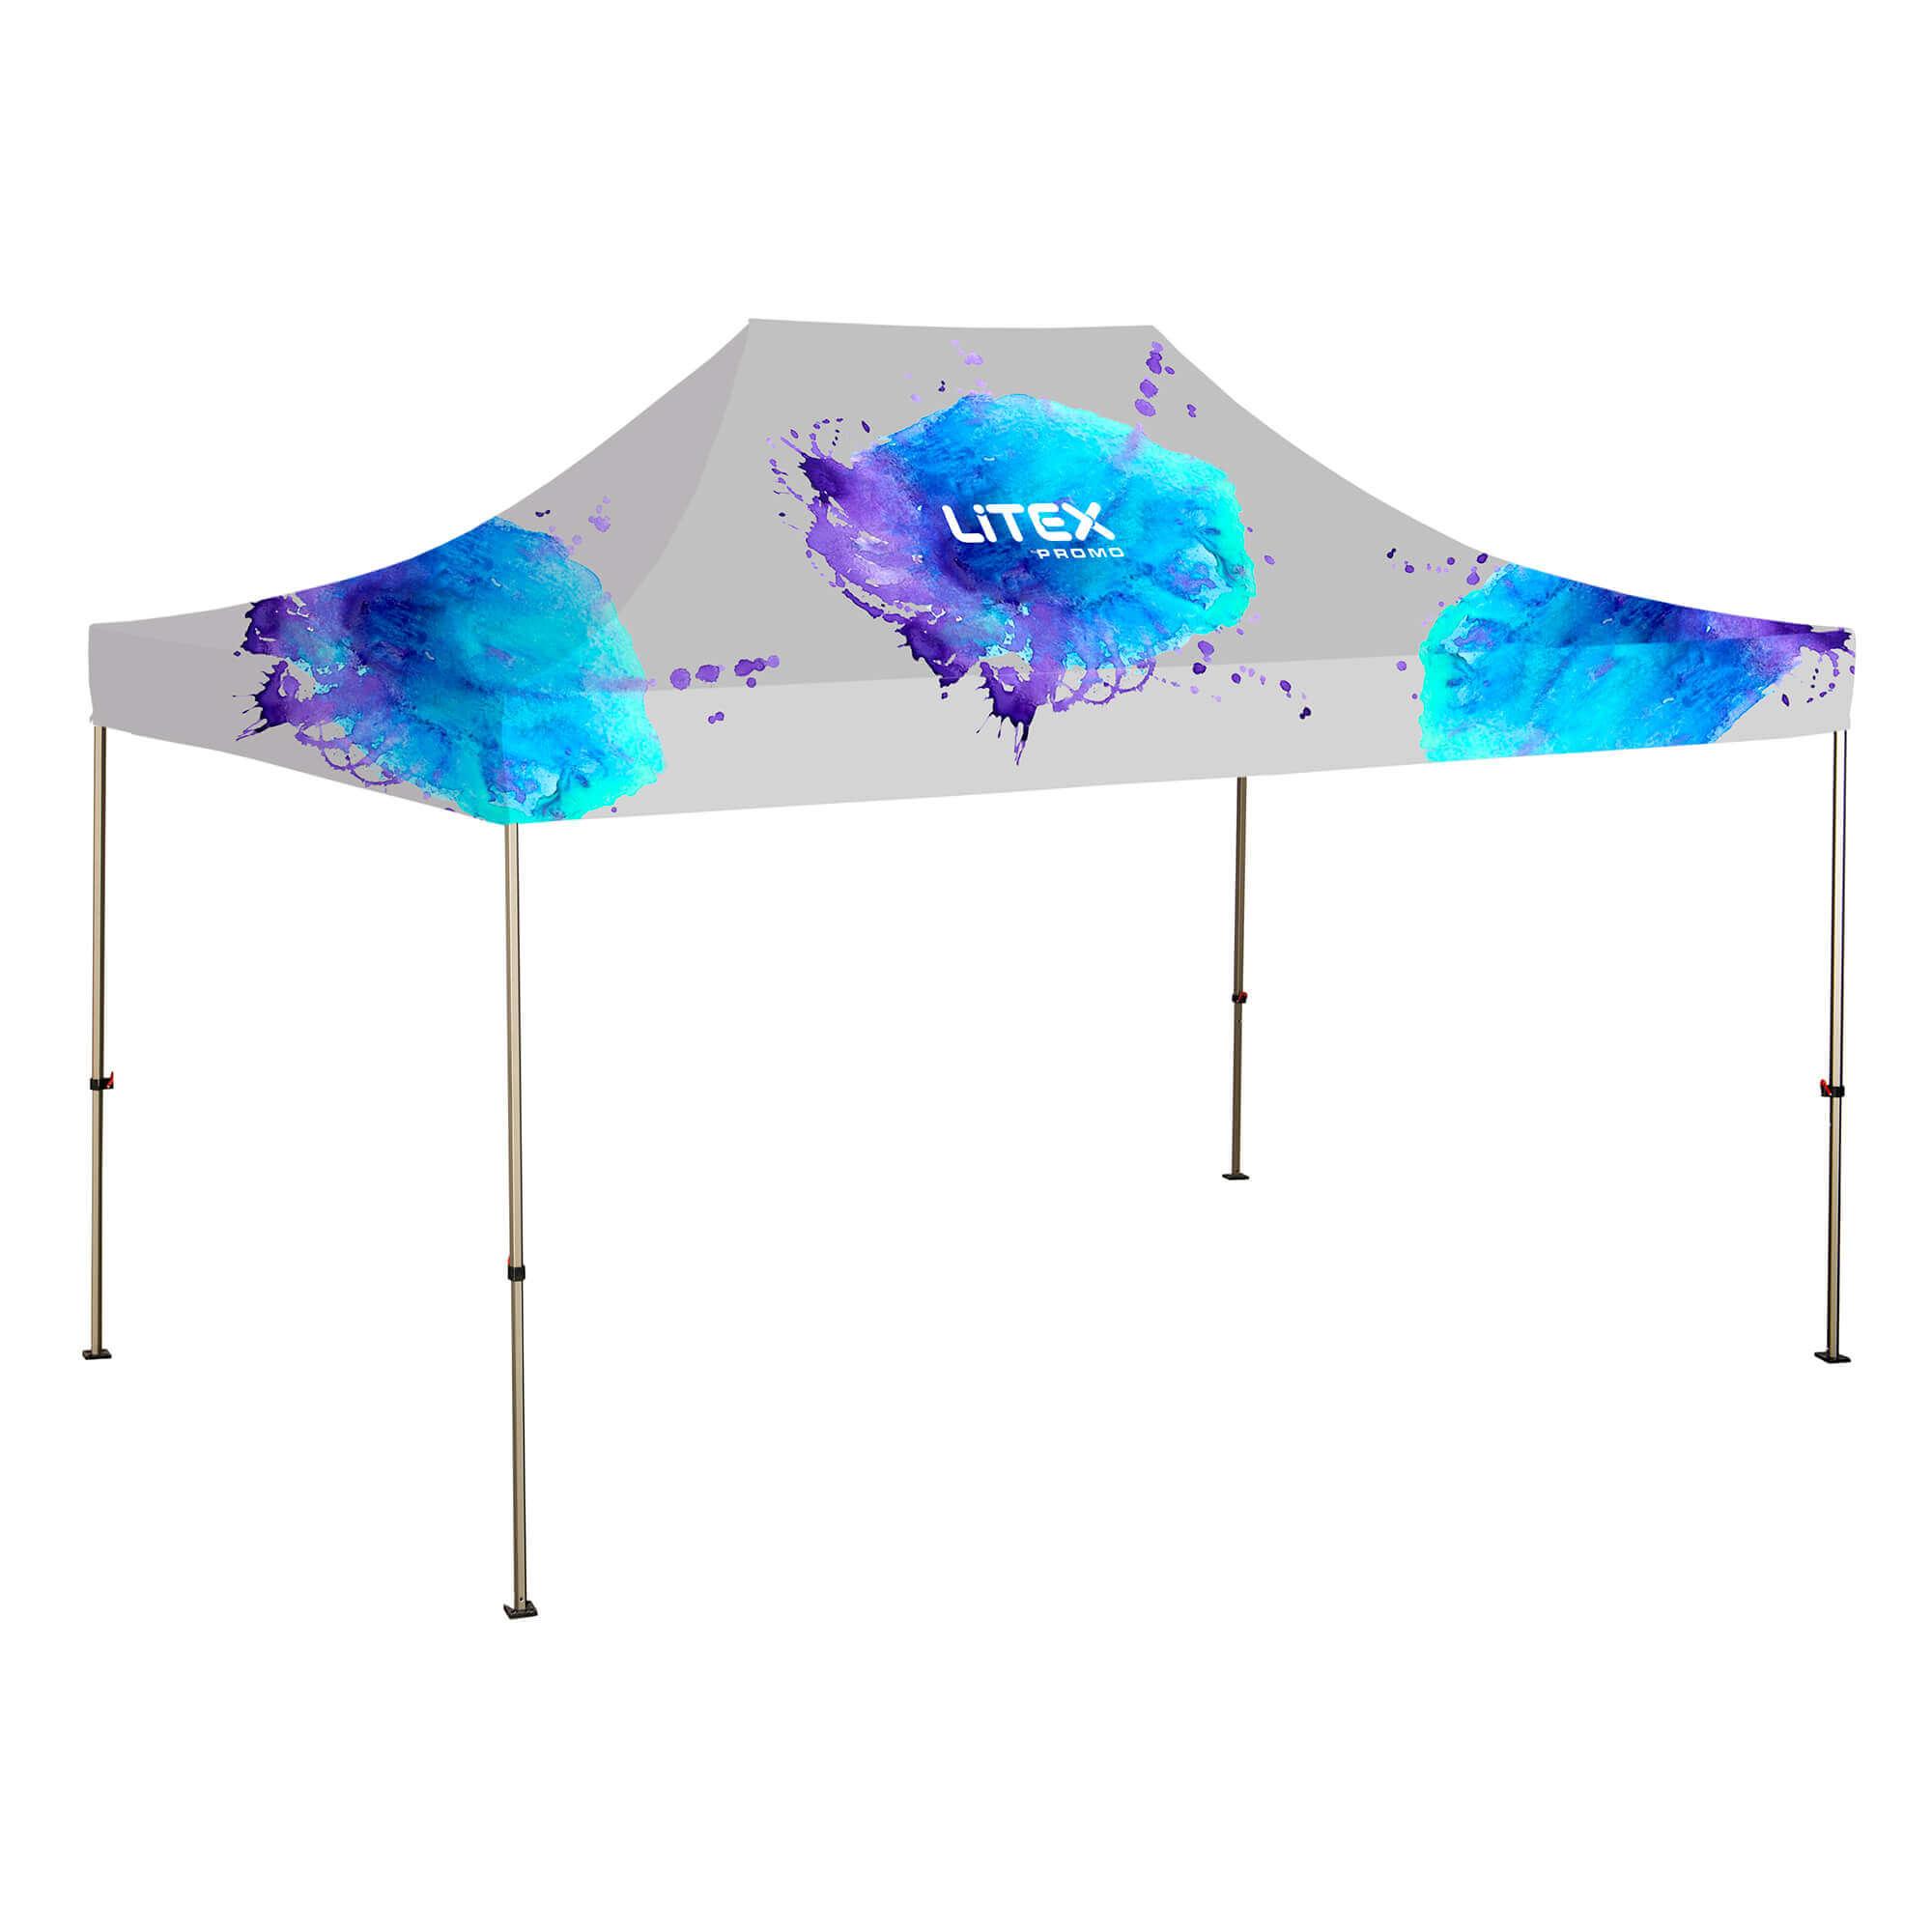 1. Namiot Szybkorozkładalny 3x4,5m